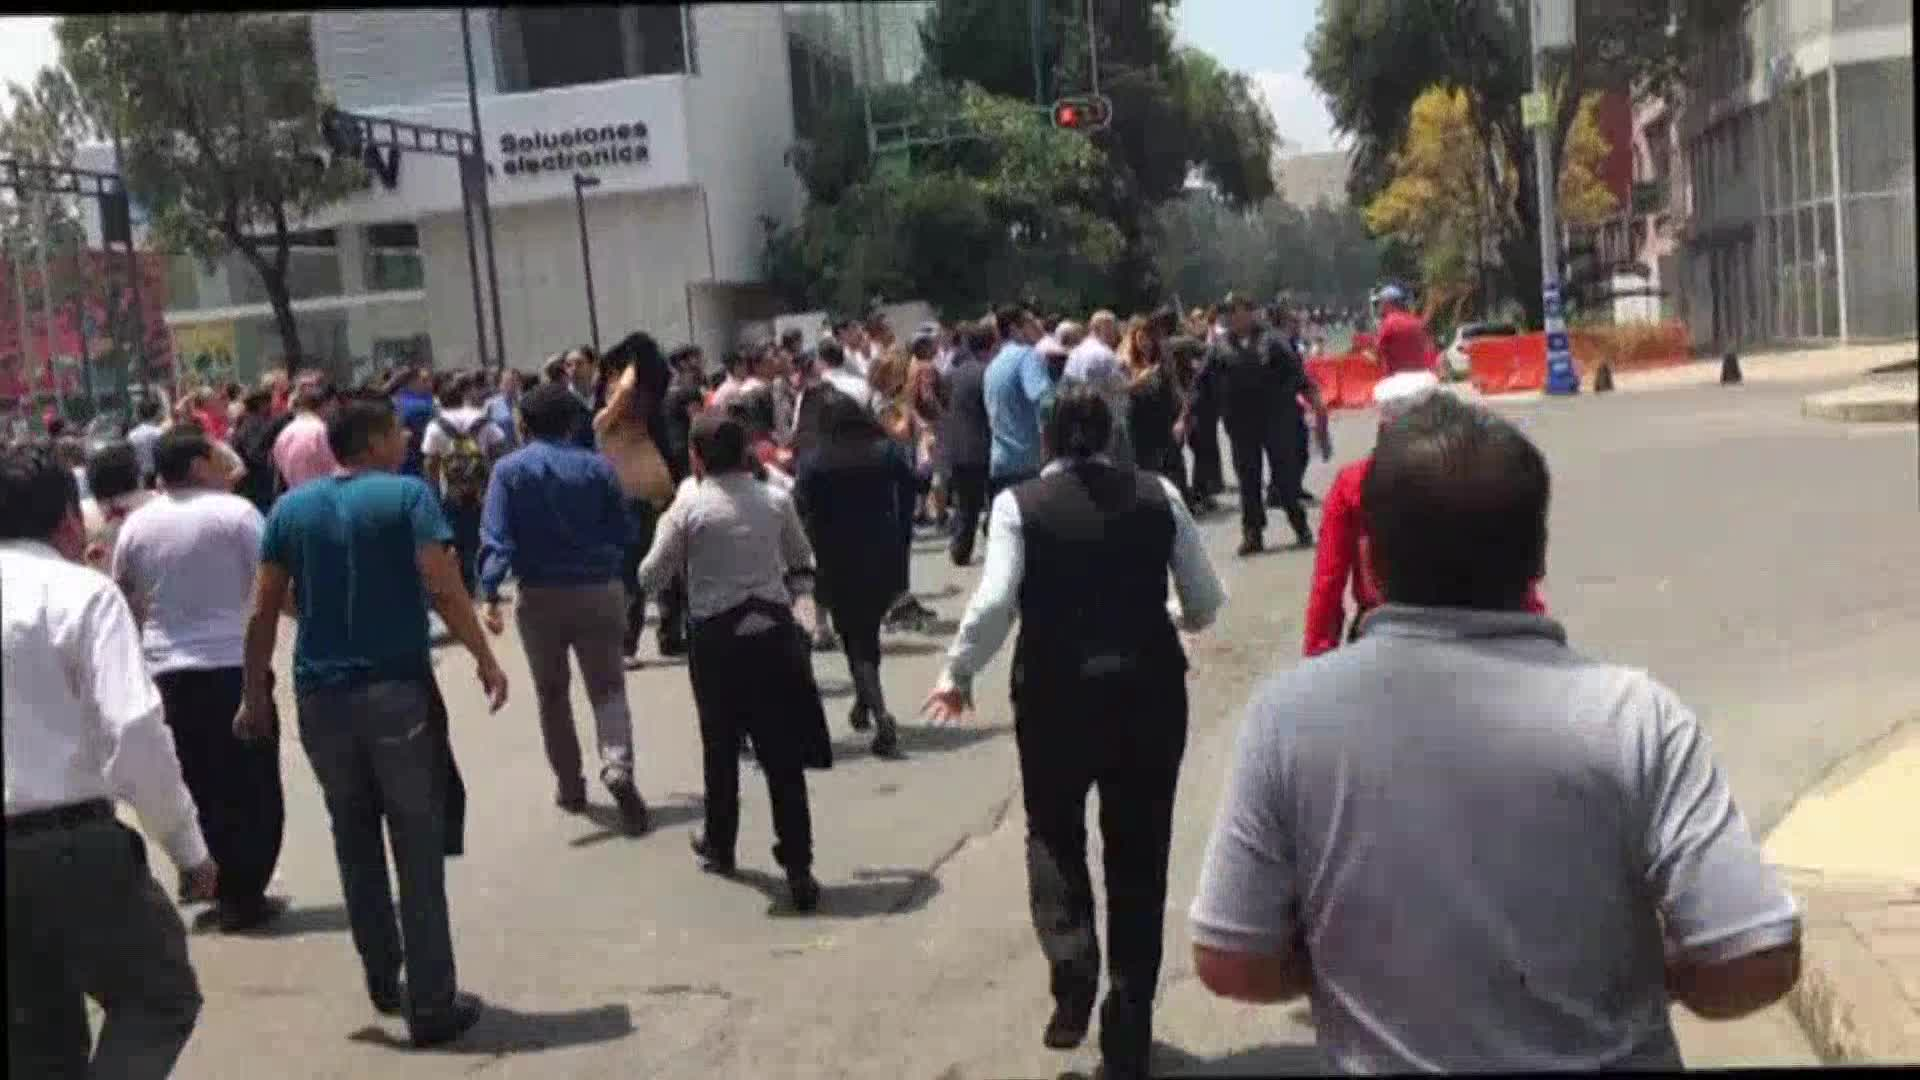 Magnitude 7.1 earthquake hits Mexico City